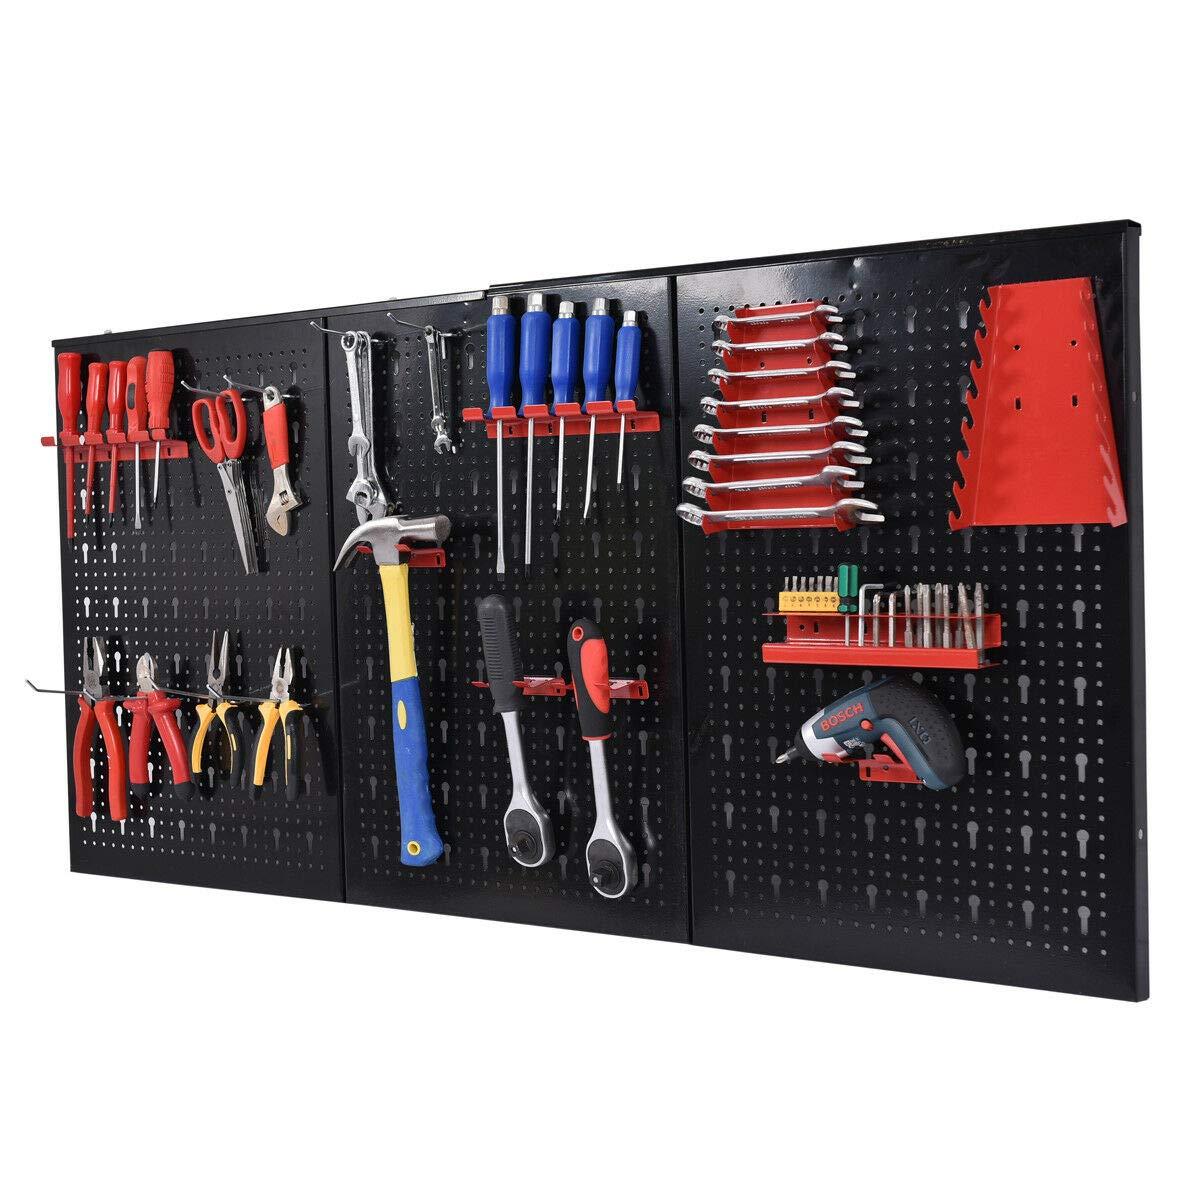 24'' x 48'' Metal Pegboard Panels Garage Tool Board Storage Organizer Holder Black by allgoodsdelight365 (Image #4)